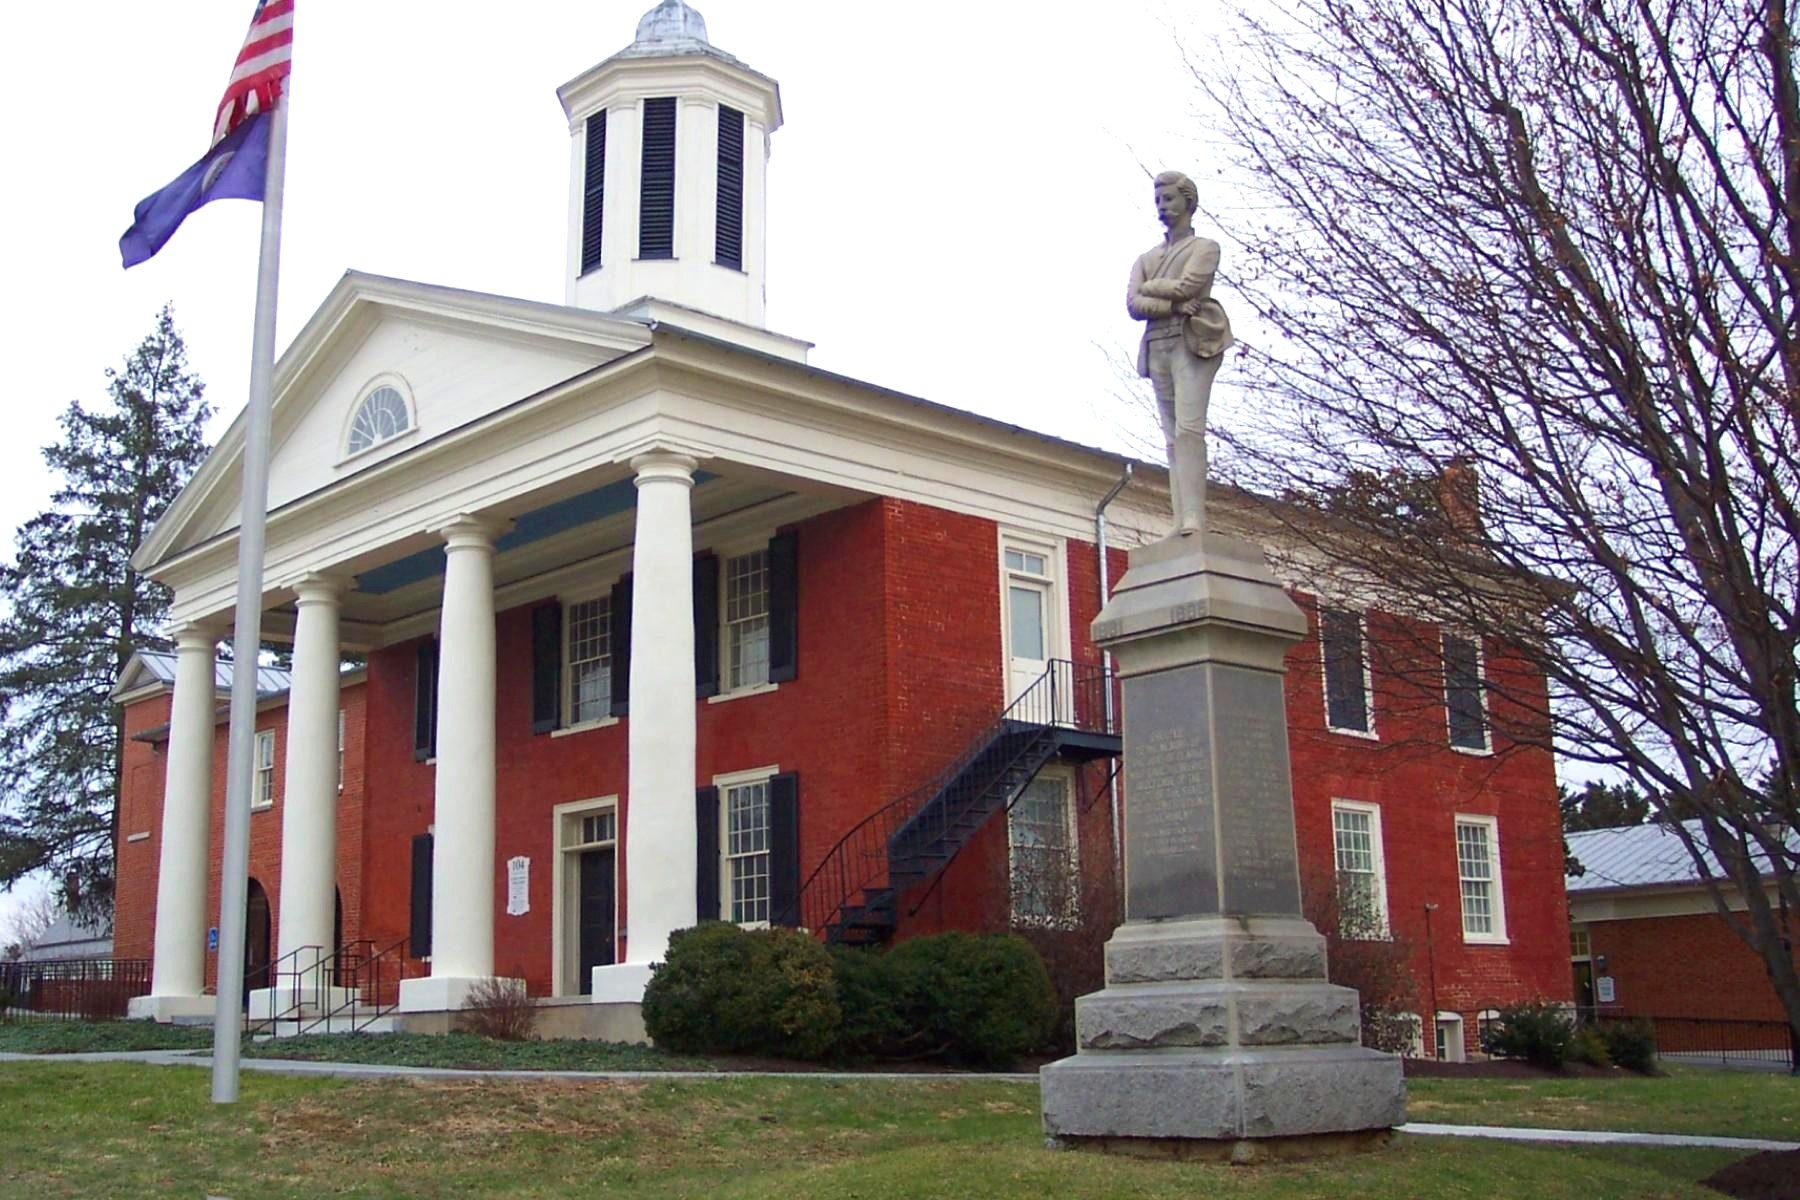 Clarke County Court House